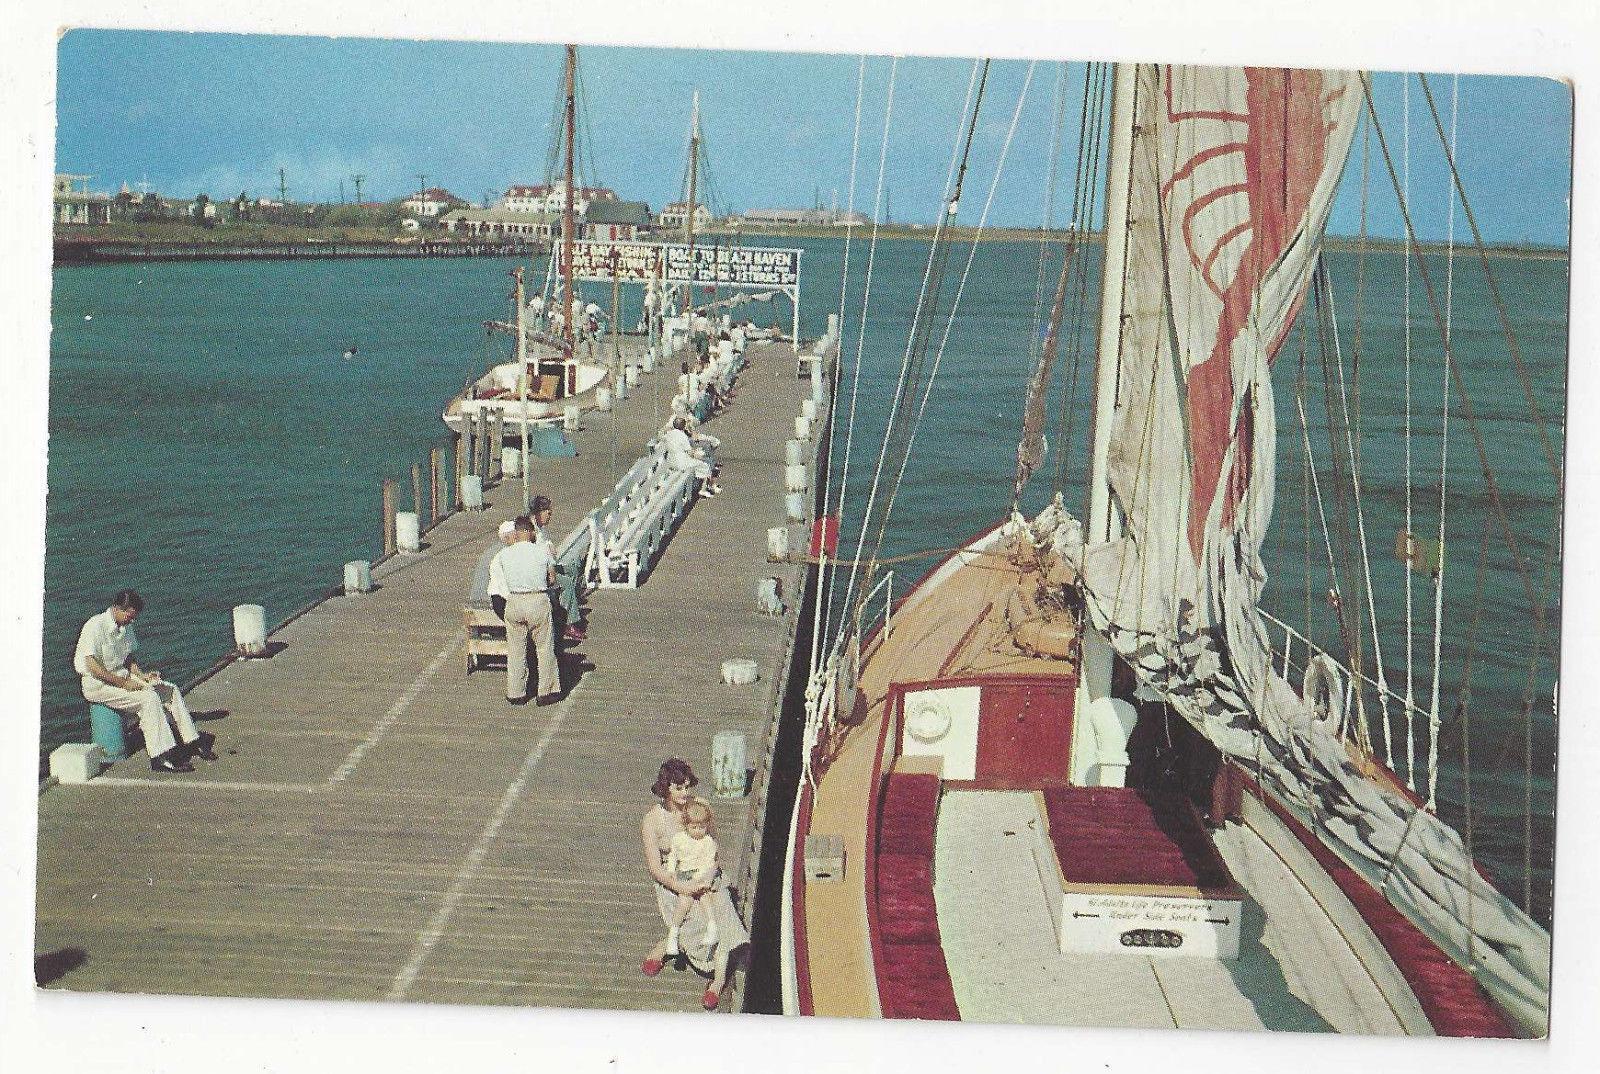 NJ Atlantic City Inlet Pier Sailboats Fishing Boats Vtg Postcard